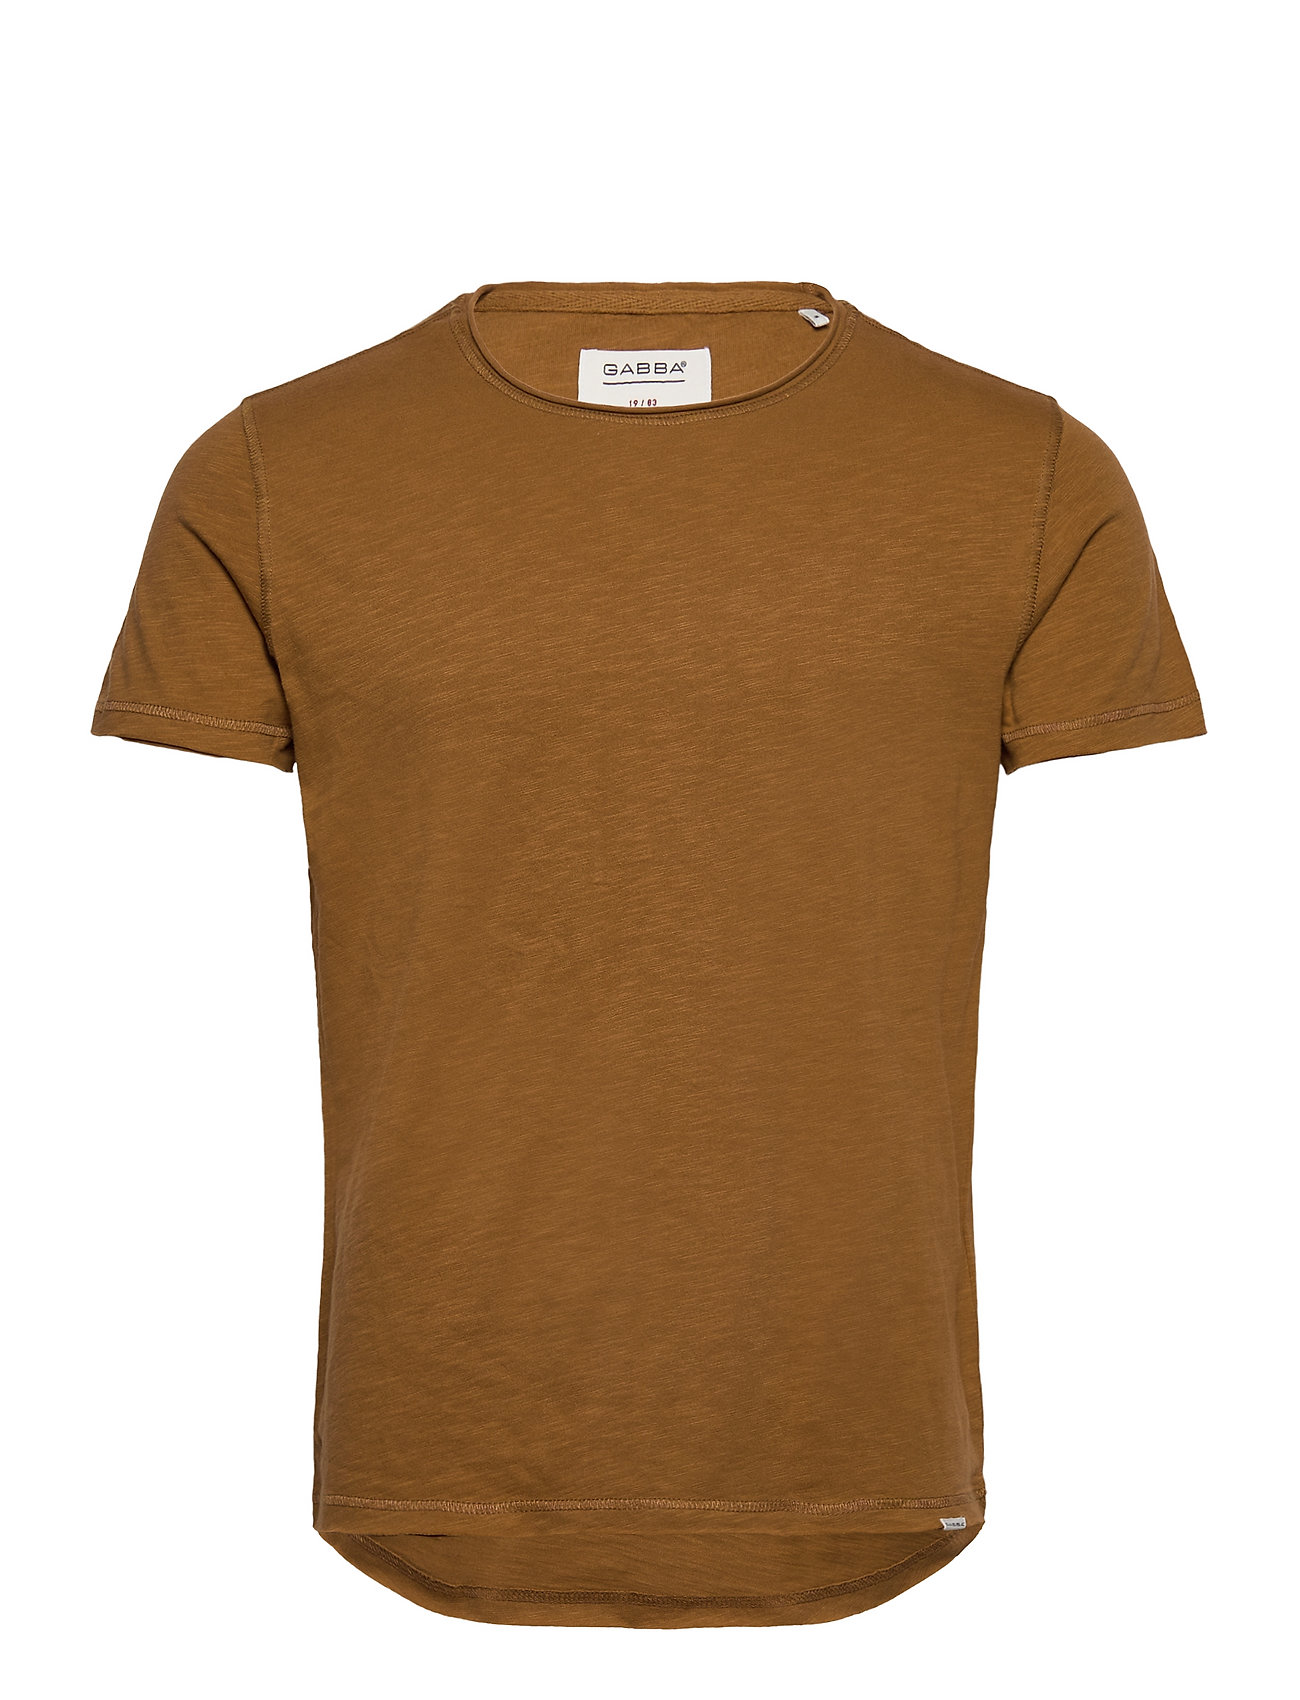 Image of Konrad Slub S/S Tee T-shirt Brun Gabba (3551194899)